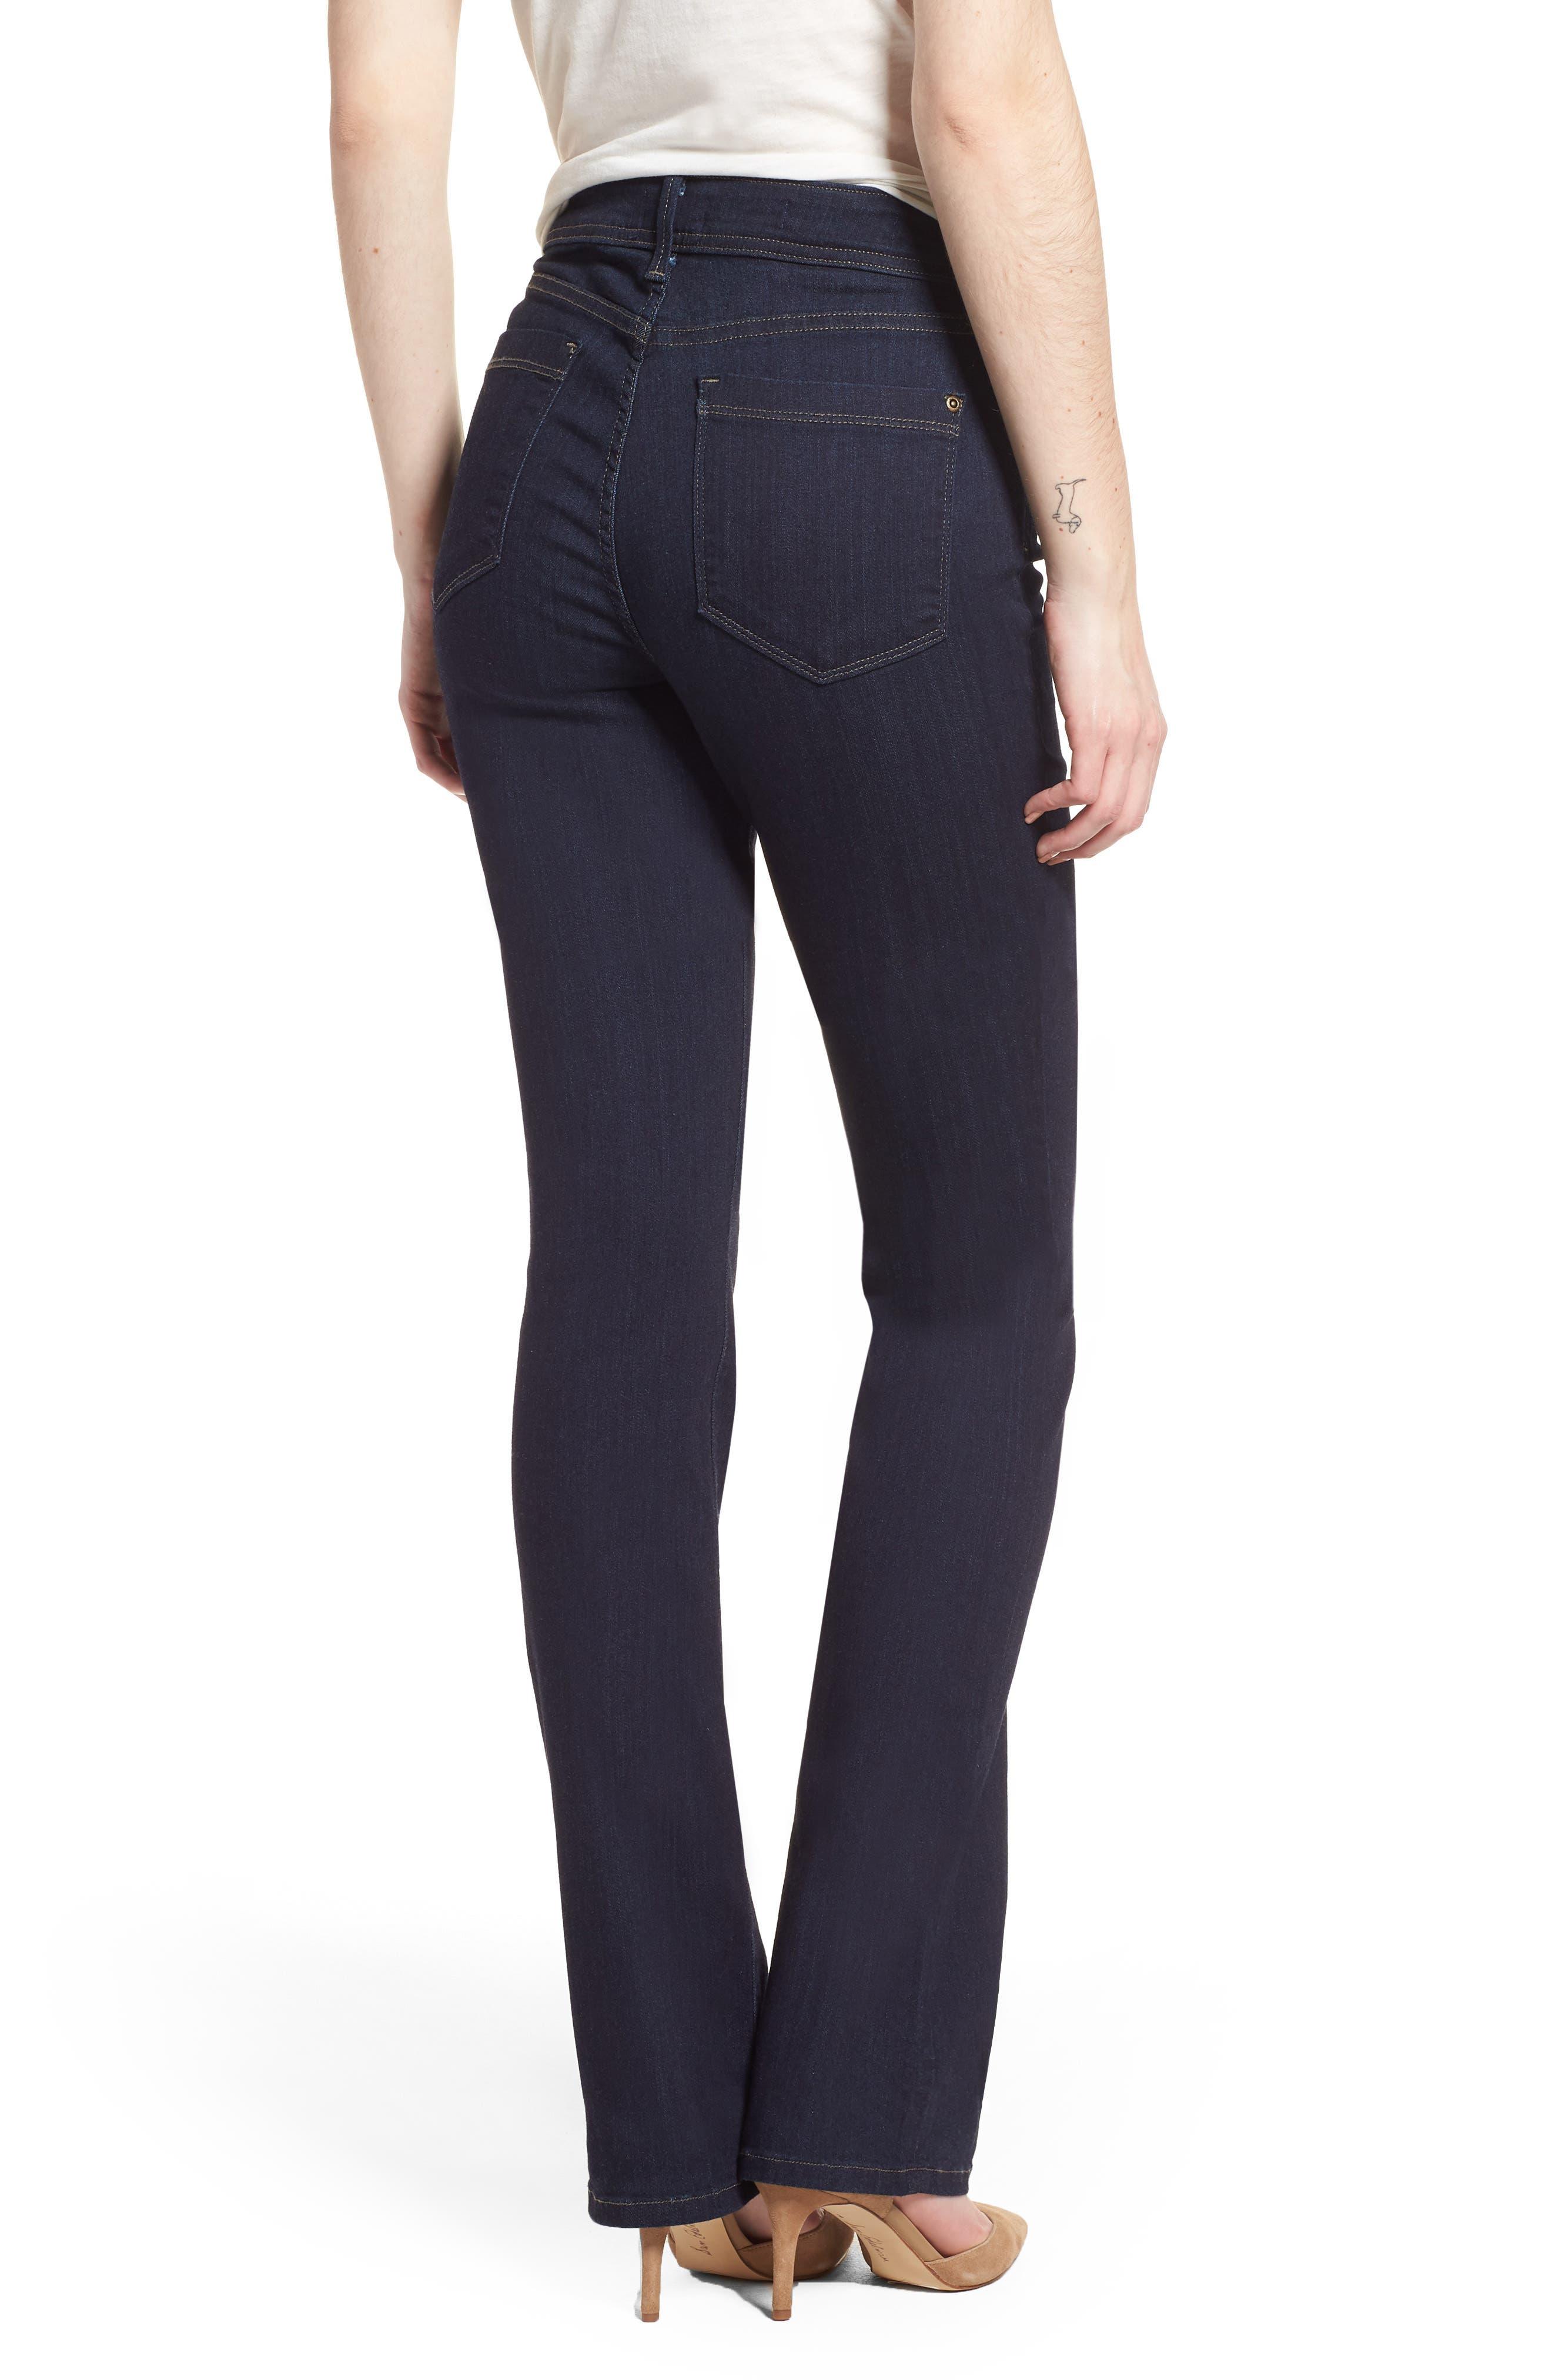 Billie Mini Bootcut Jeans,                             Alternate thumbnail 2, color,                             Mabel